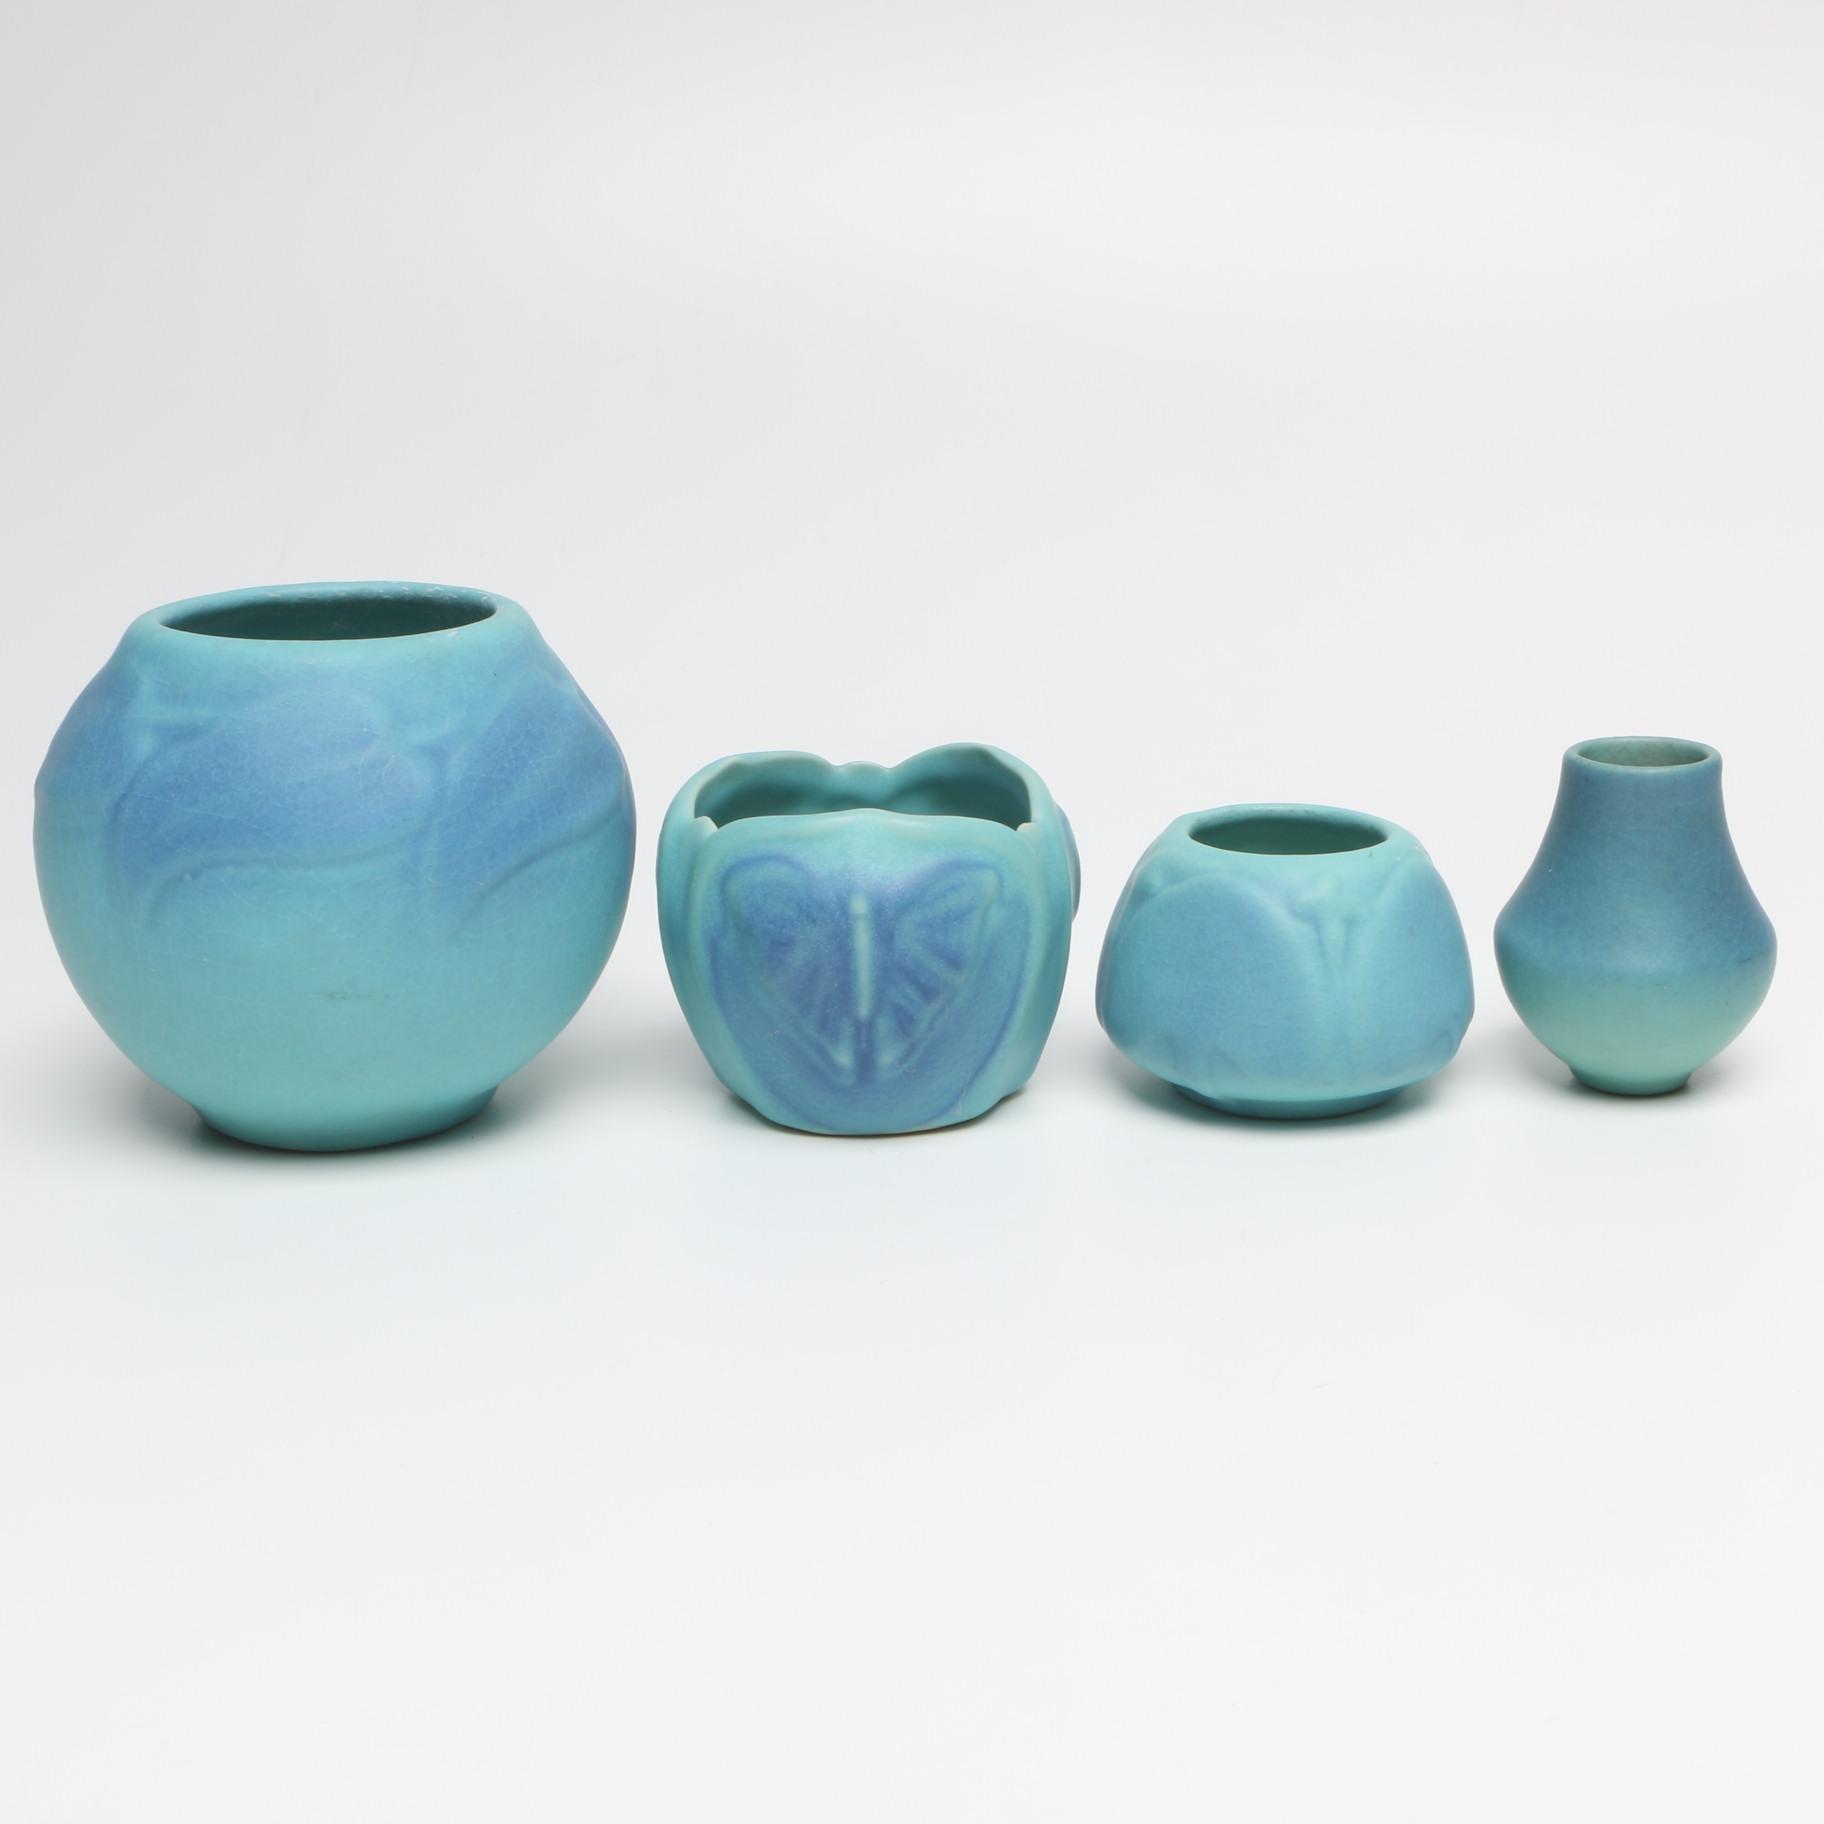 Van Briggle Ming Blue Ceramic Vases and Vessels